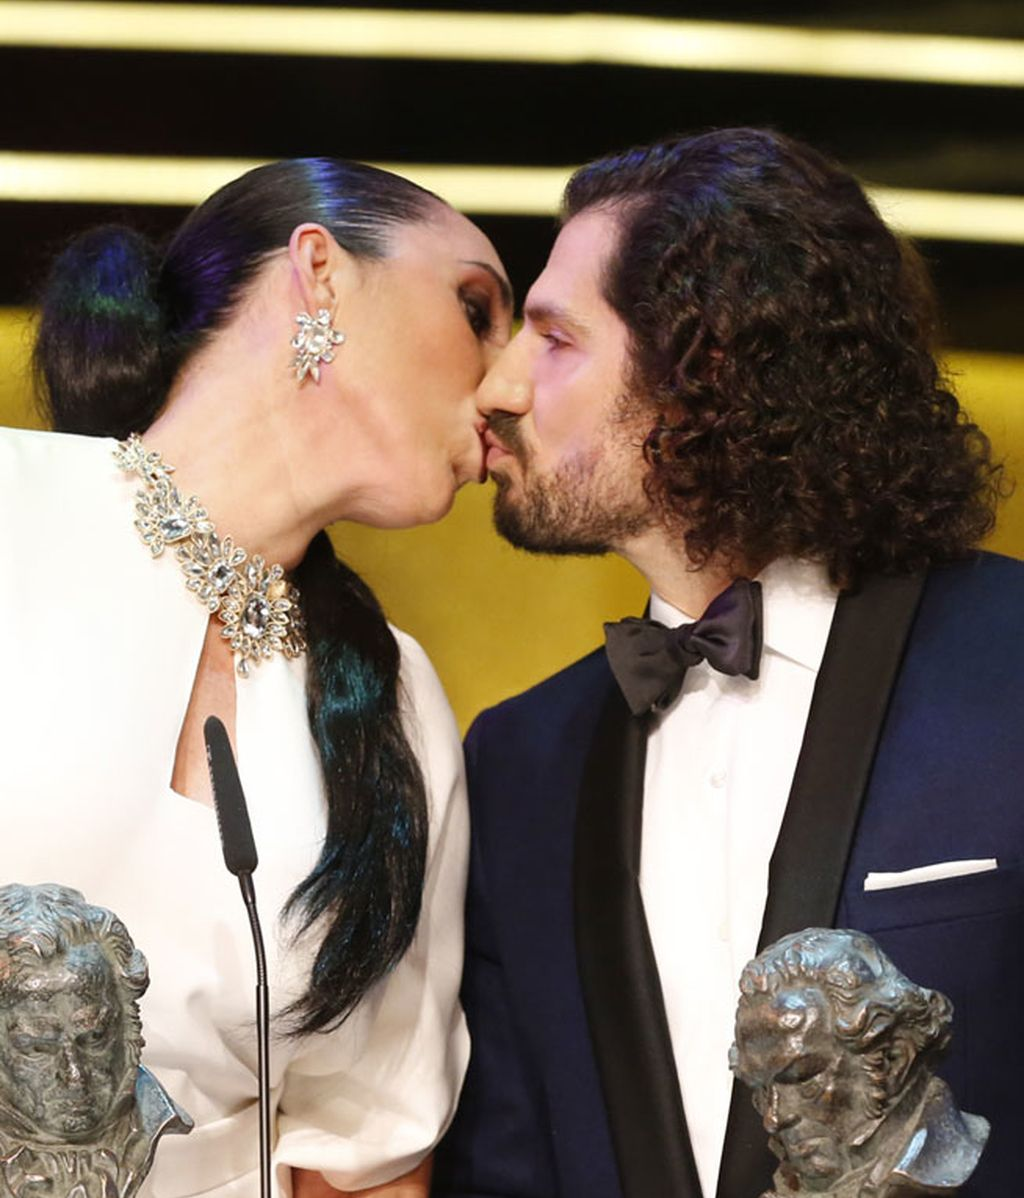 Y también besó al director de cine Jorge Torregrossa